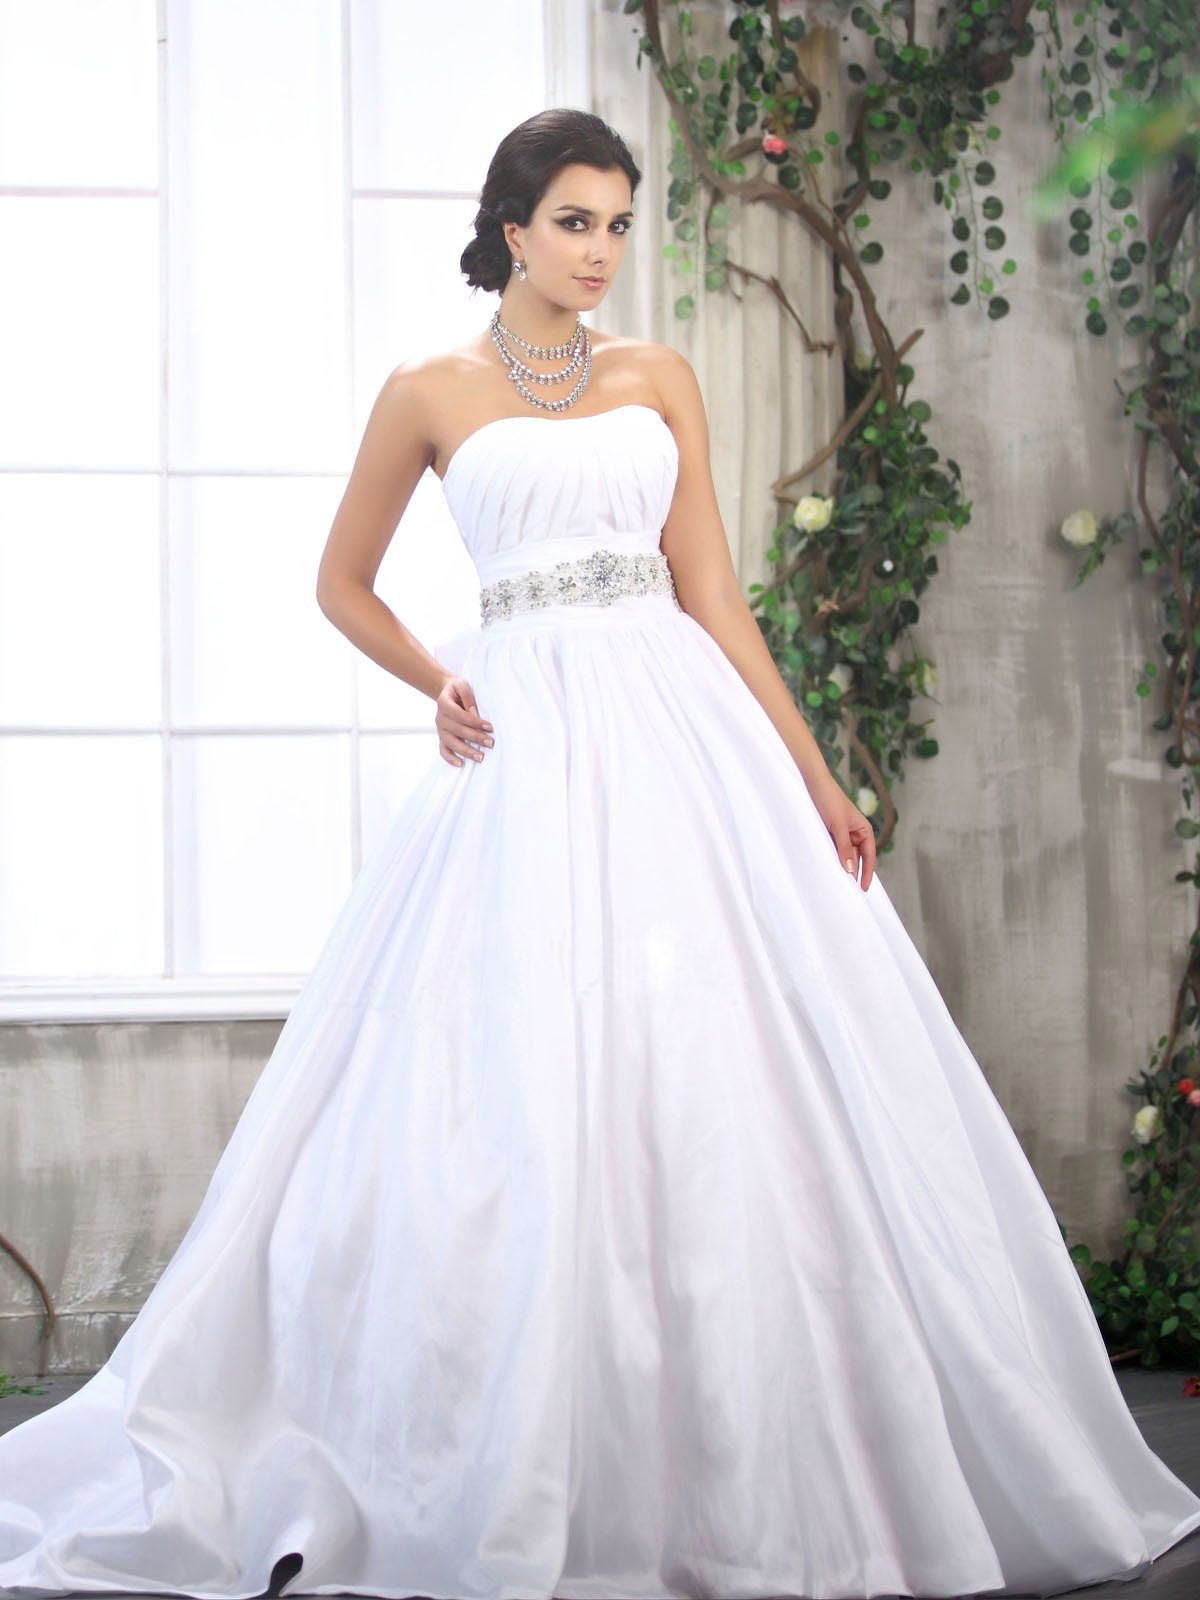 17 Best images about wedding dress on Pinterest | Western weddings ...